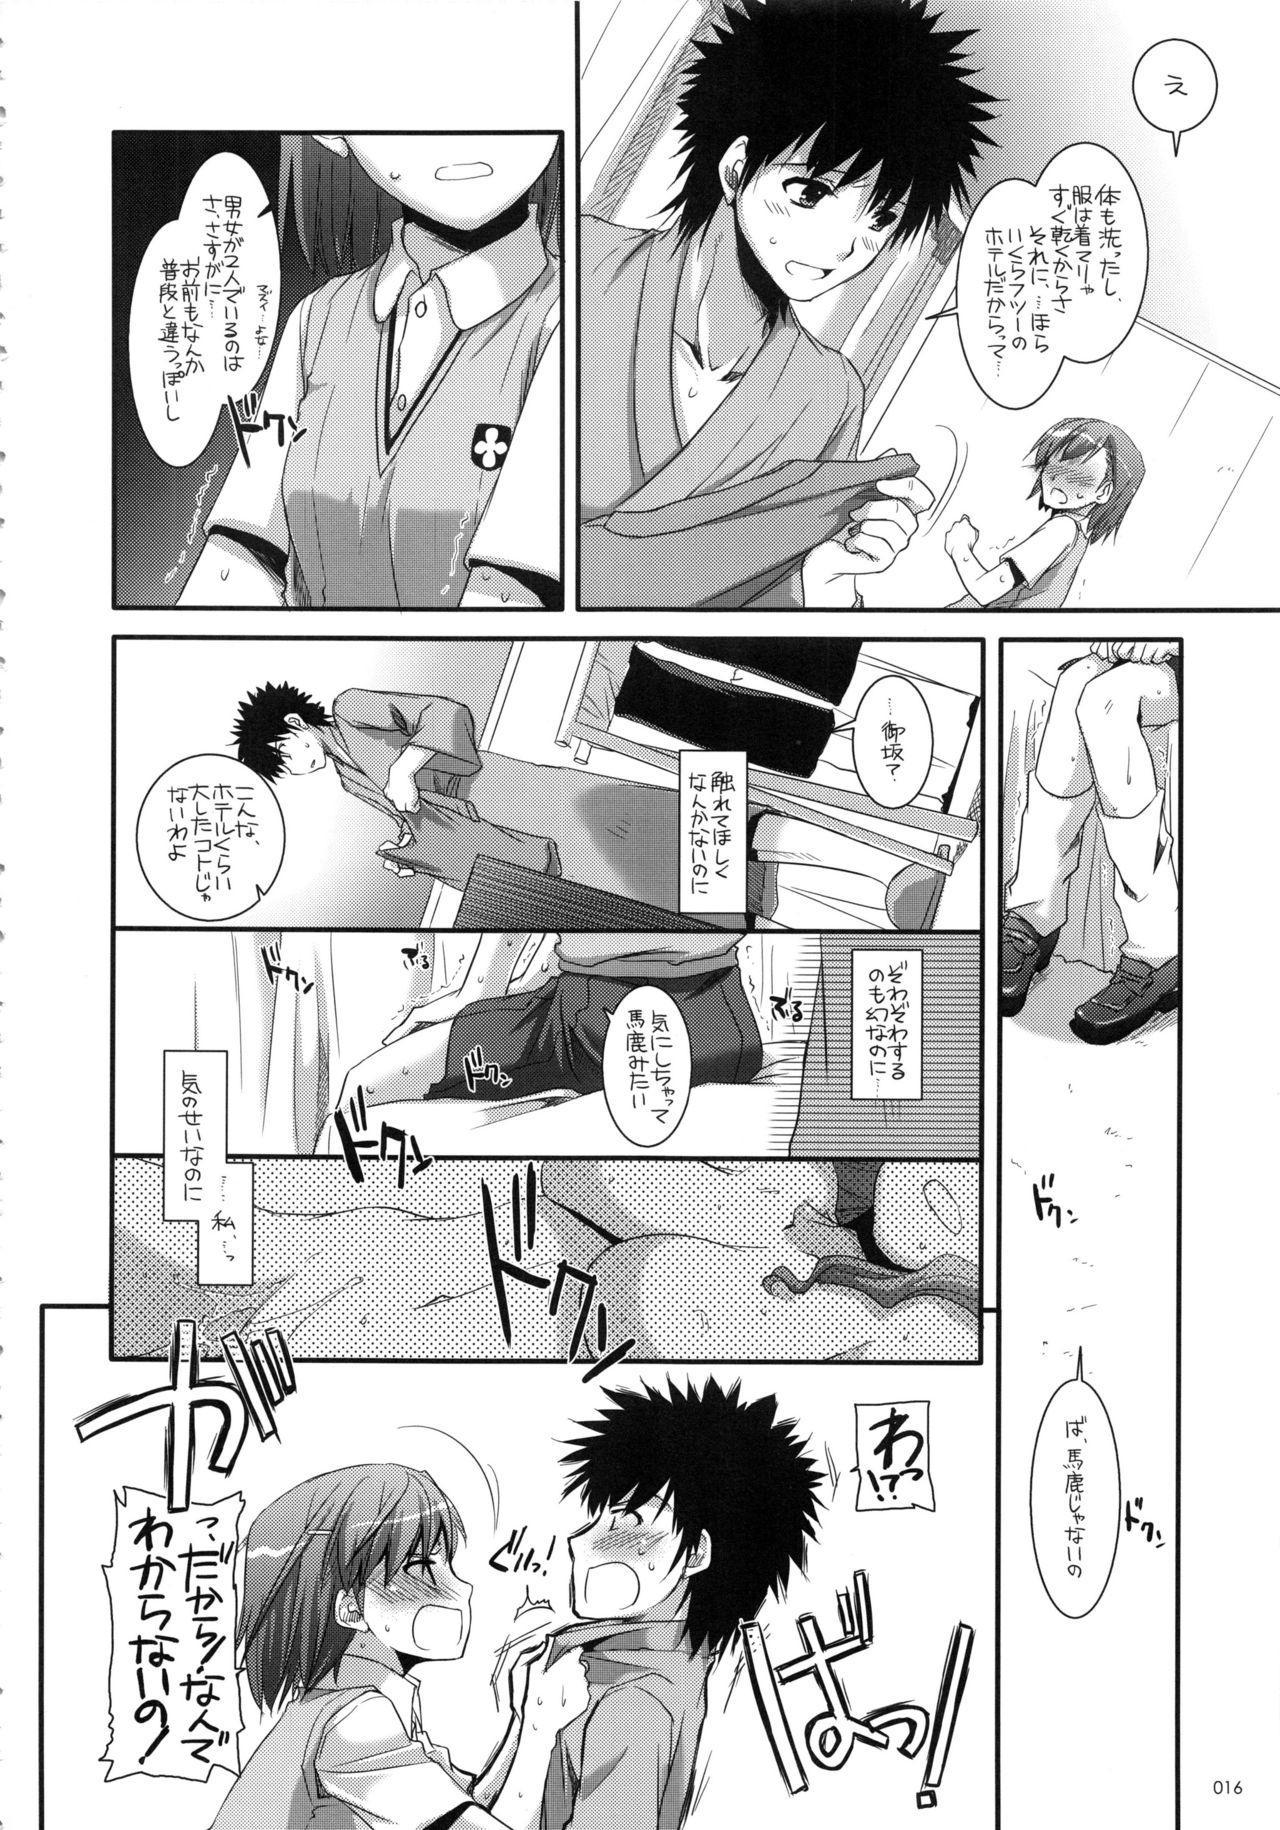 DL - Toaru Soushuuhen 14